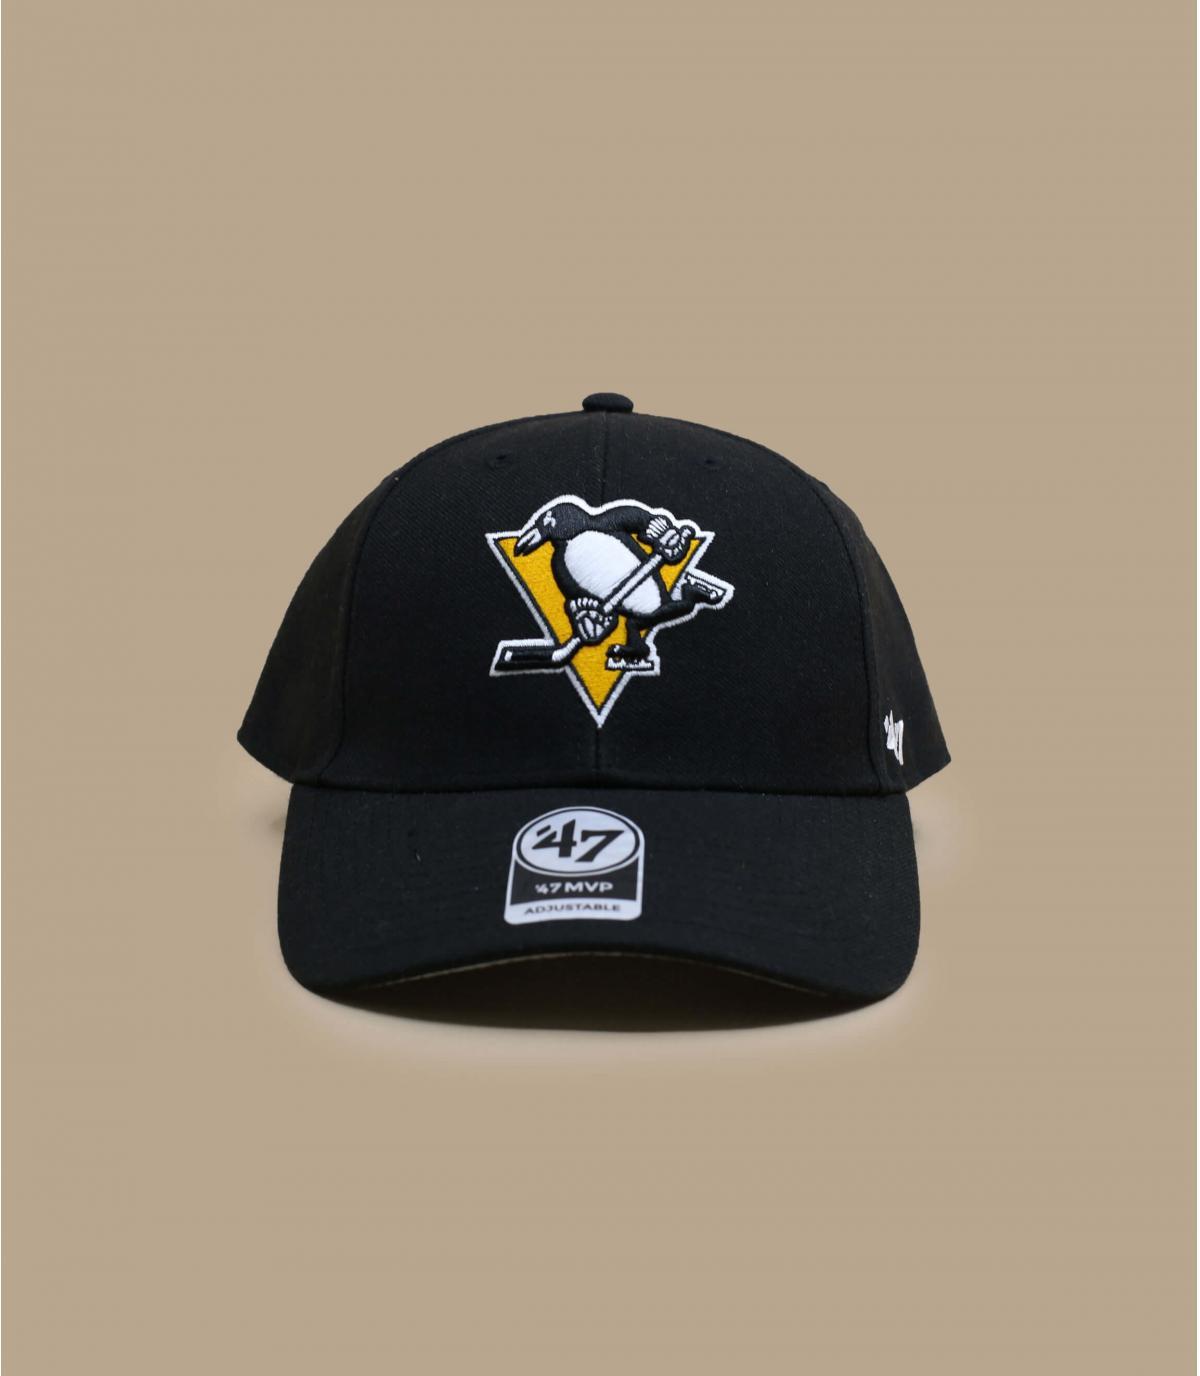 black Penguins cap